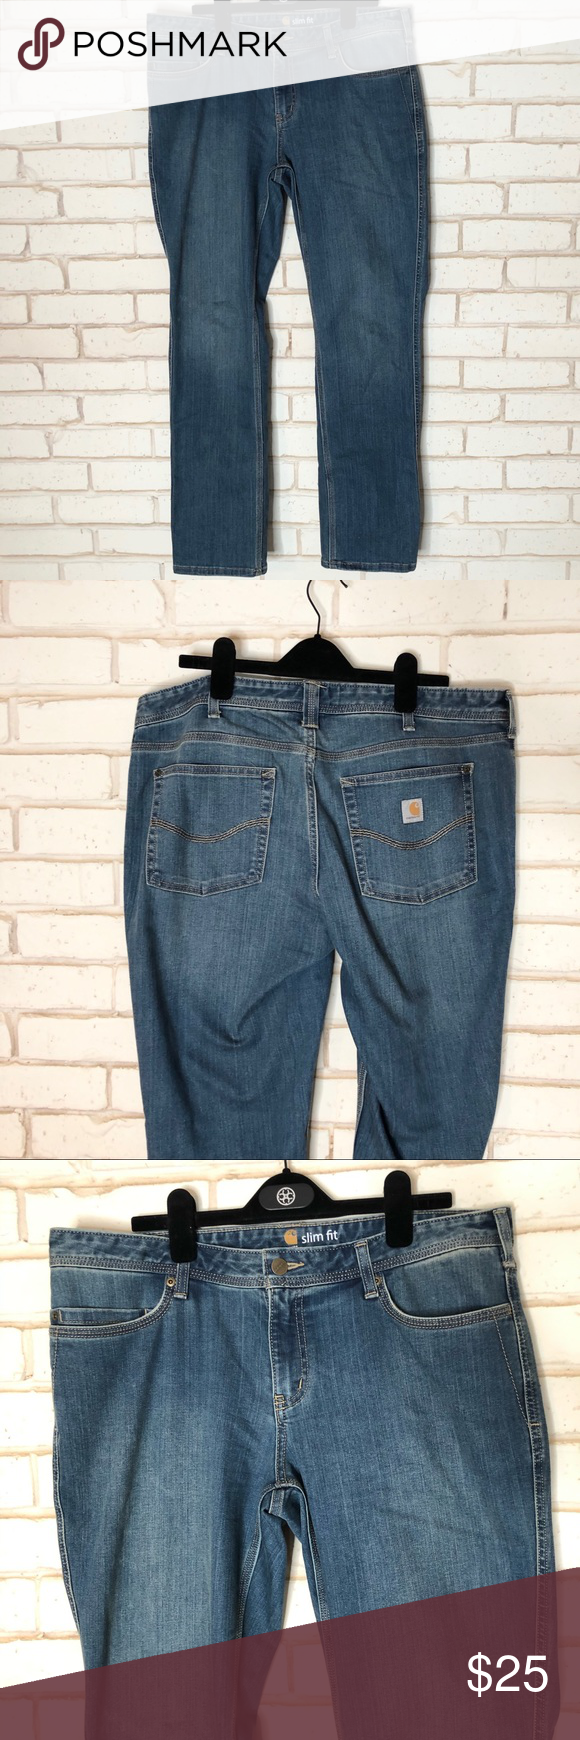 Carhartt Womens Slim Fit Jeans Sz 14 EUC Durable Carhartt Jeans. Sz 14 Slim Fit Great Jeans! Mid rise  Waist 19 Rise 9 Inseam 31 Carhartt Jeans #carharttwomen